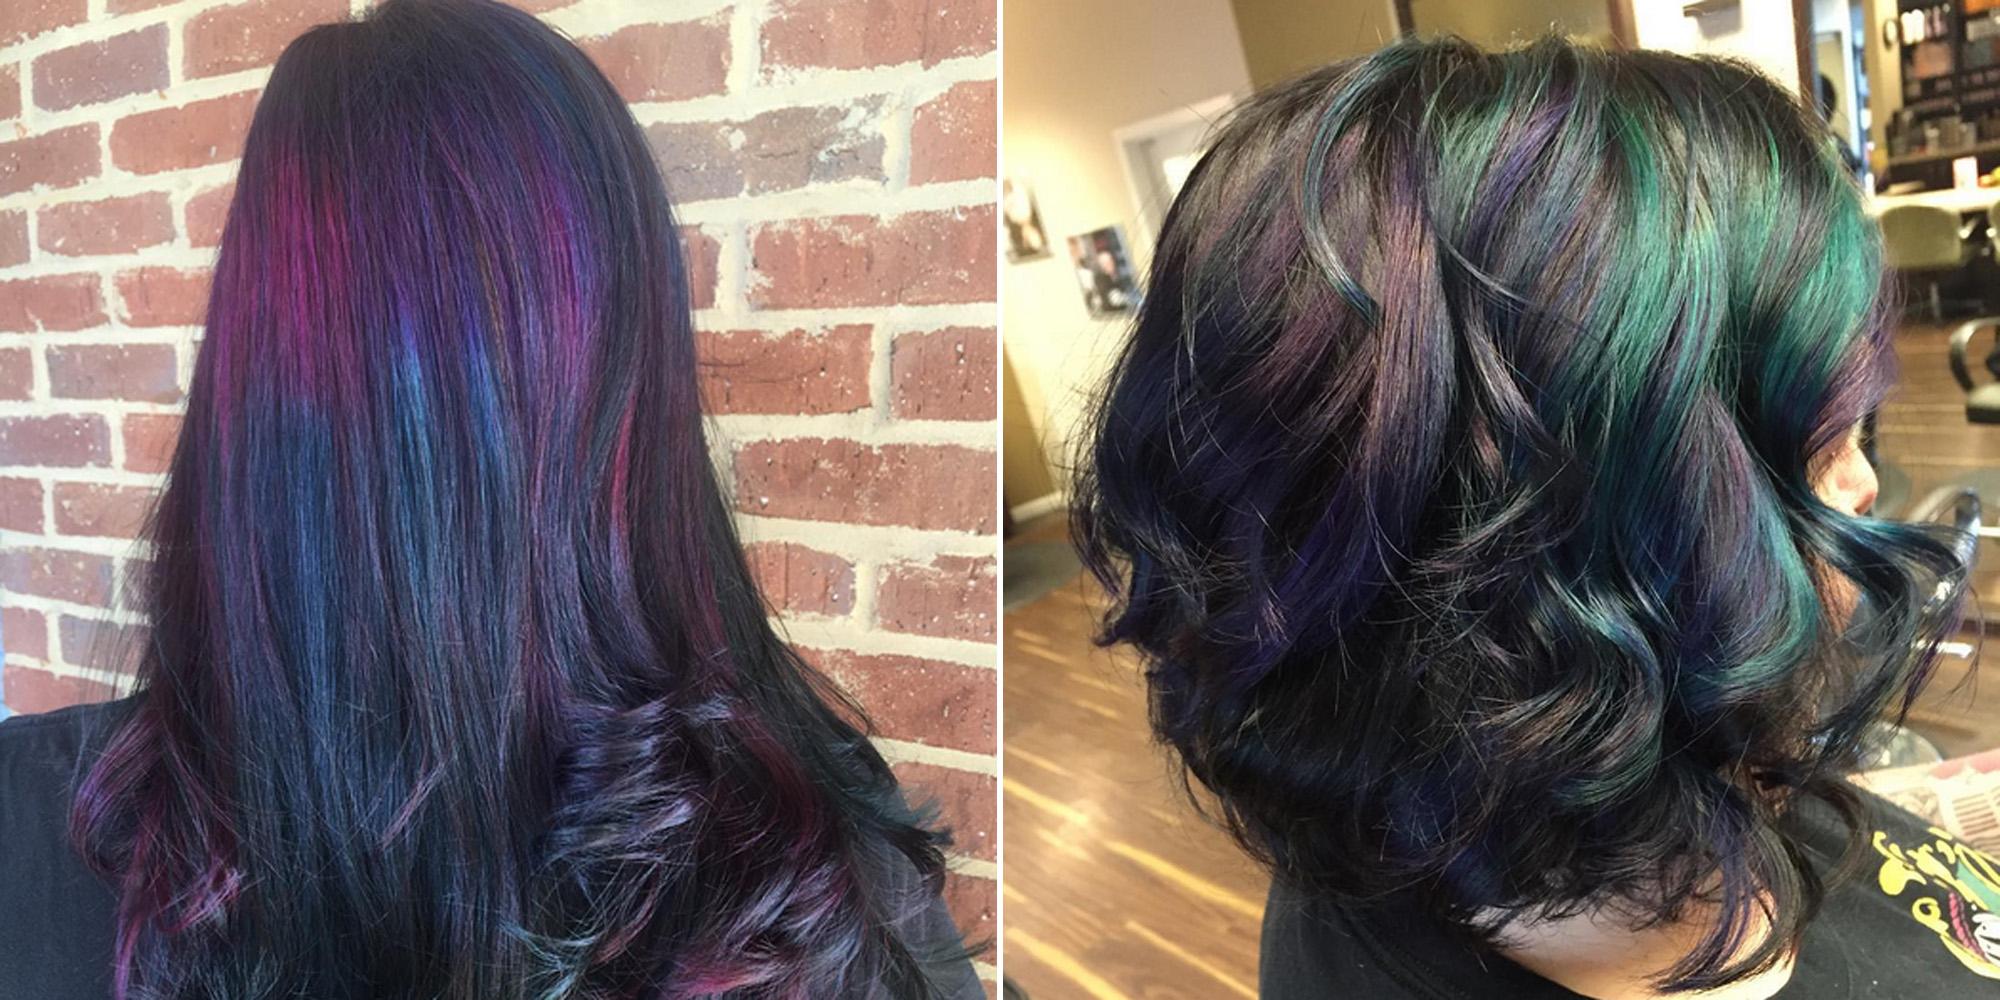 Oil Slick Hair Color Trend